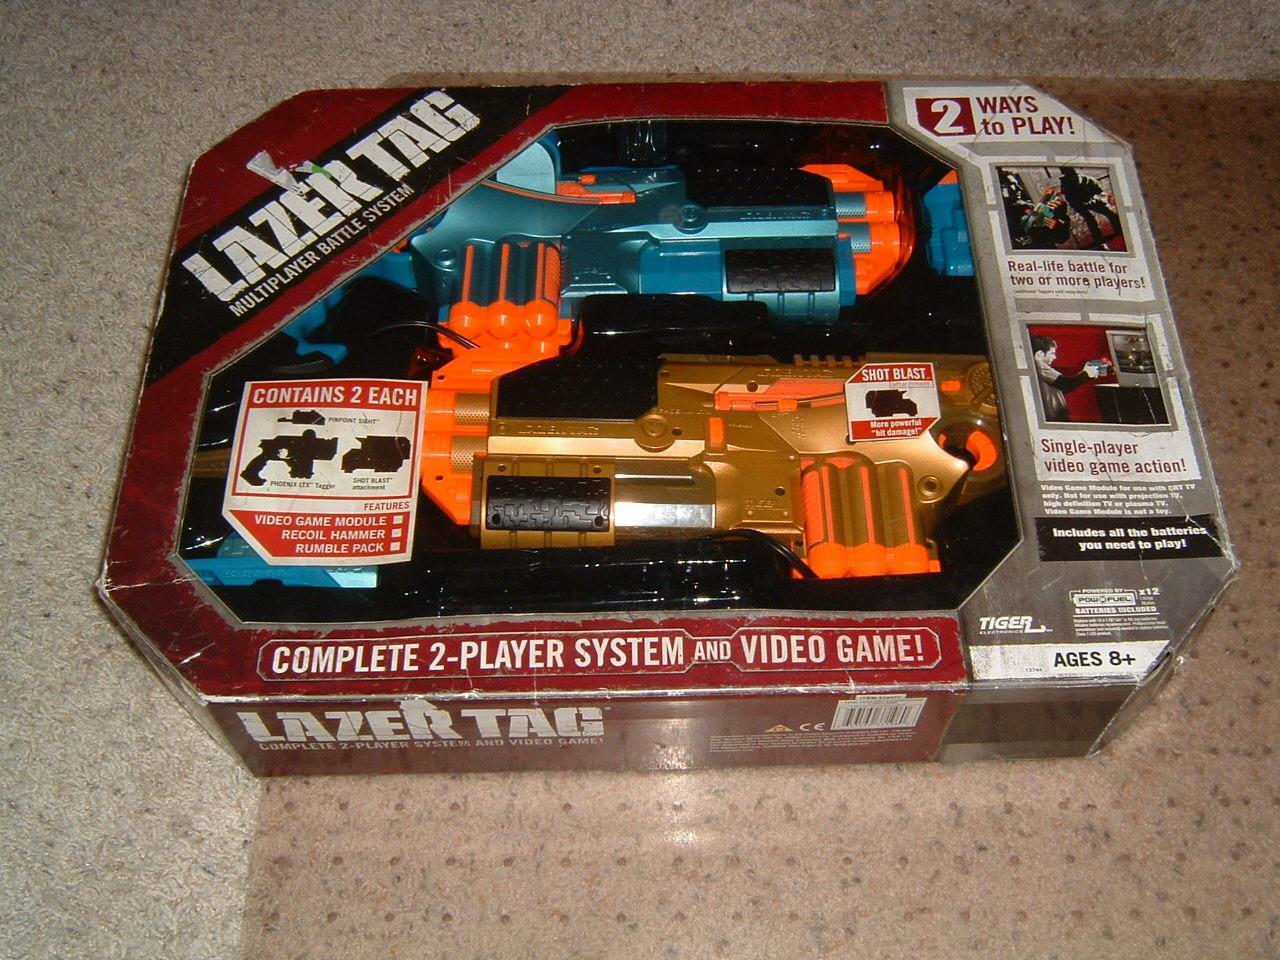 1 Tiger Electronics Hasbro Set Of 2 Laser Lazer Tag Guns